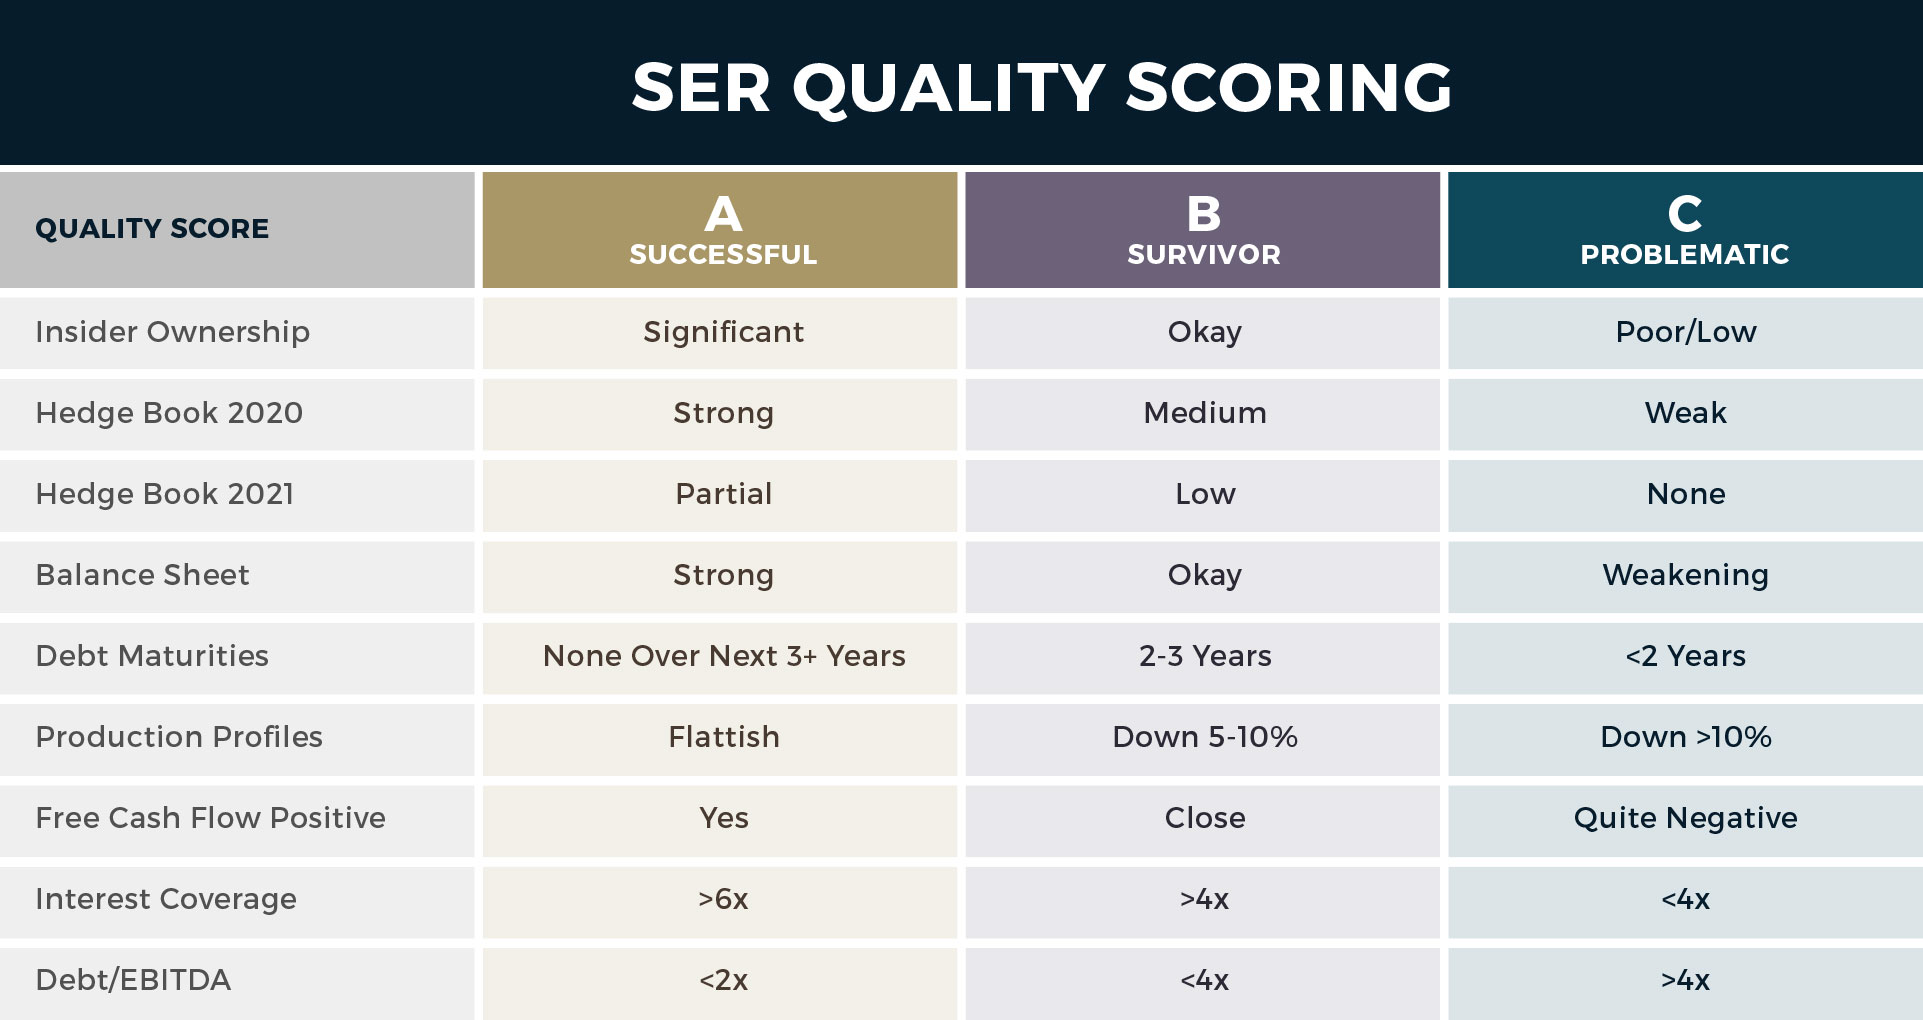 Quality Scoring